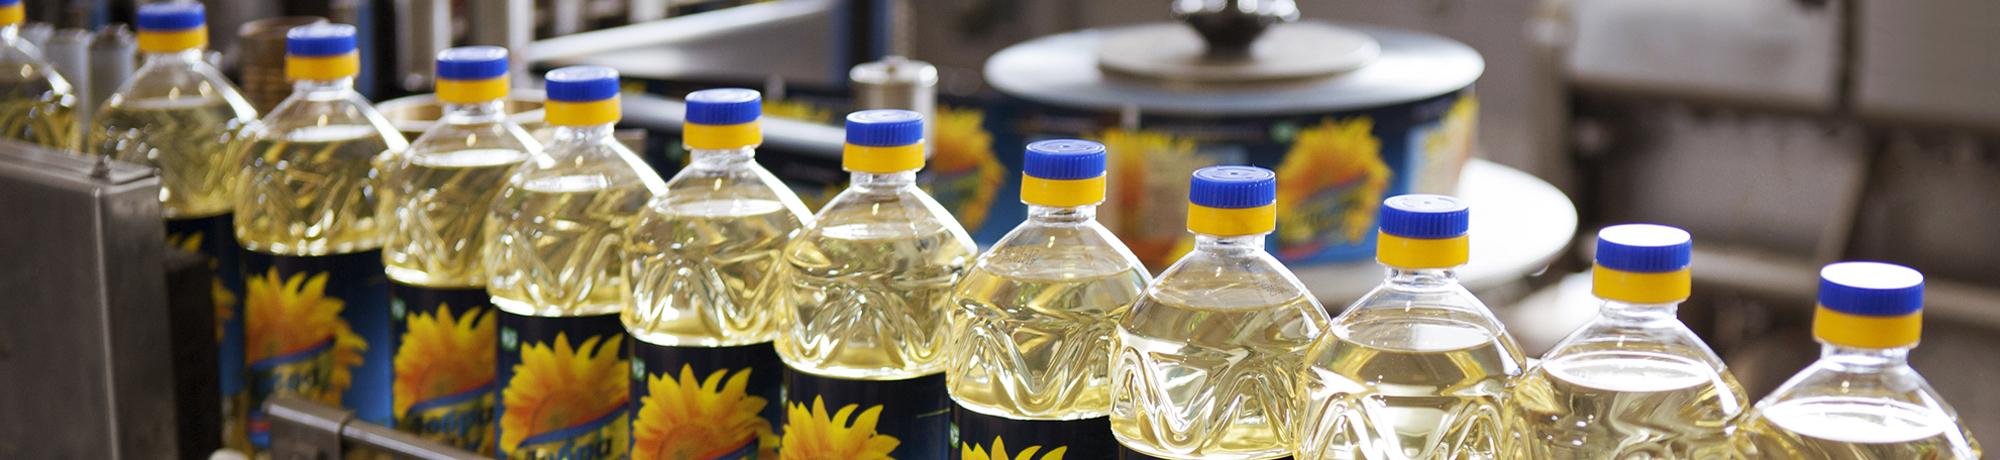 Завод розлива и фасования масла